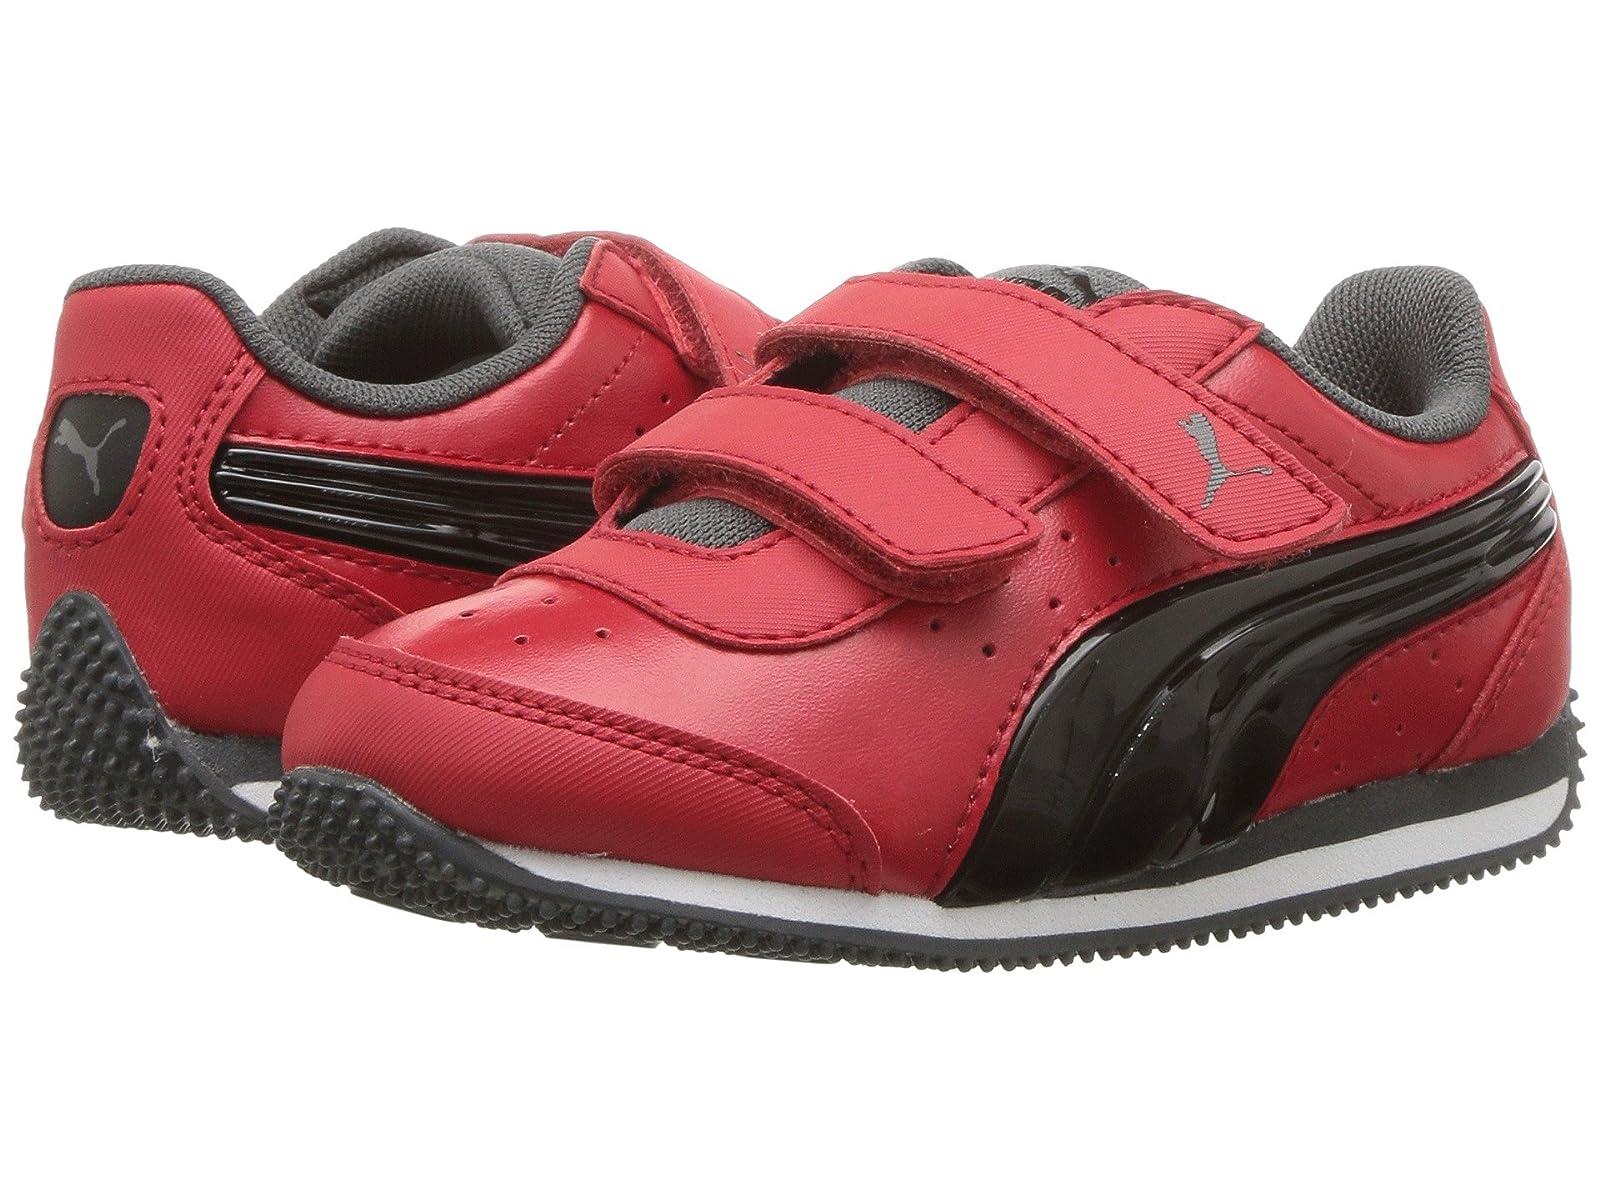 Puma Kids Speed Lightup Power V (Toddler)Atmospheric grades have affordable shoes